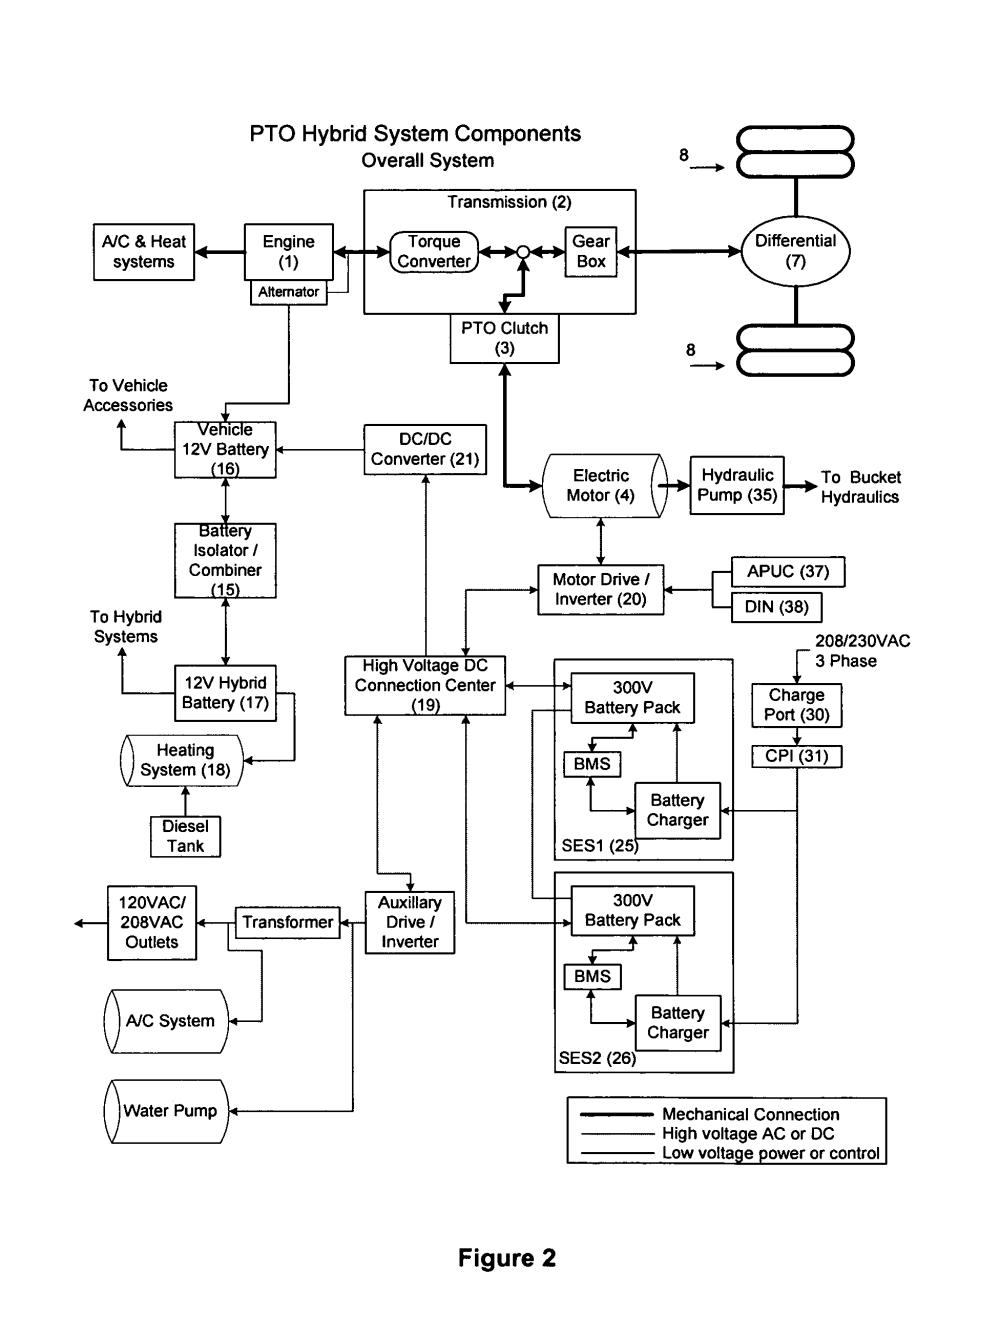 medium resolution of 1996 bluebird bus wiring diagram trusted wiring diagram s13 sr20det diagrams bluebird bus wiring diagrams bluebird